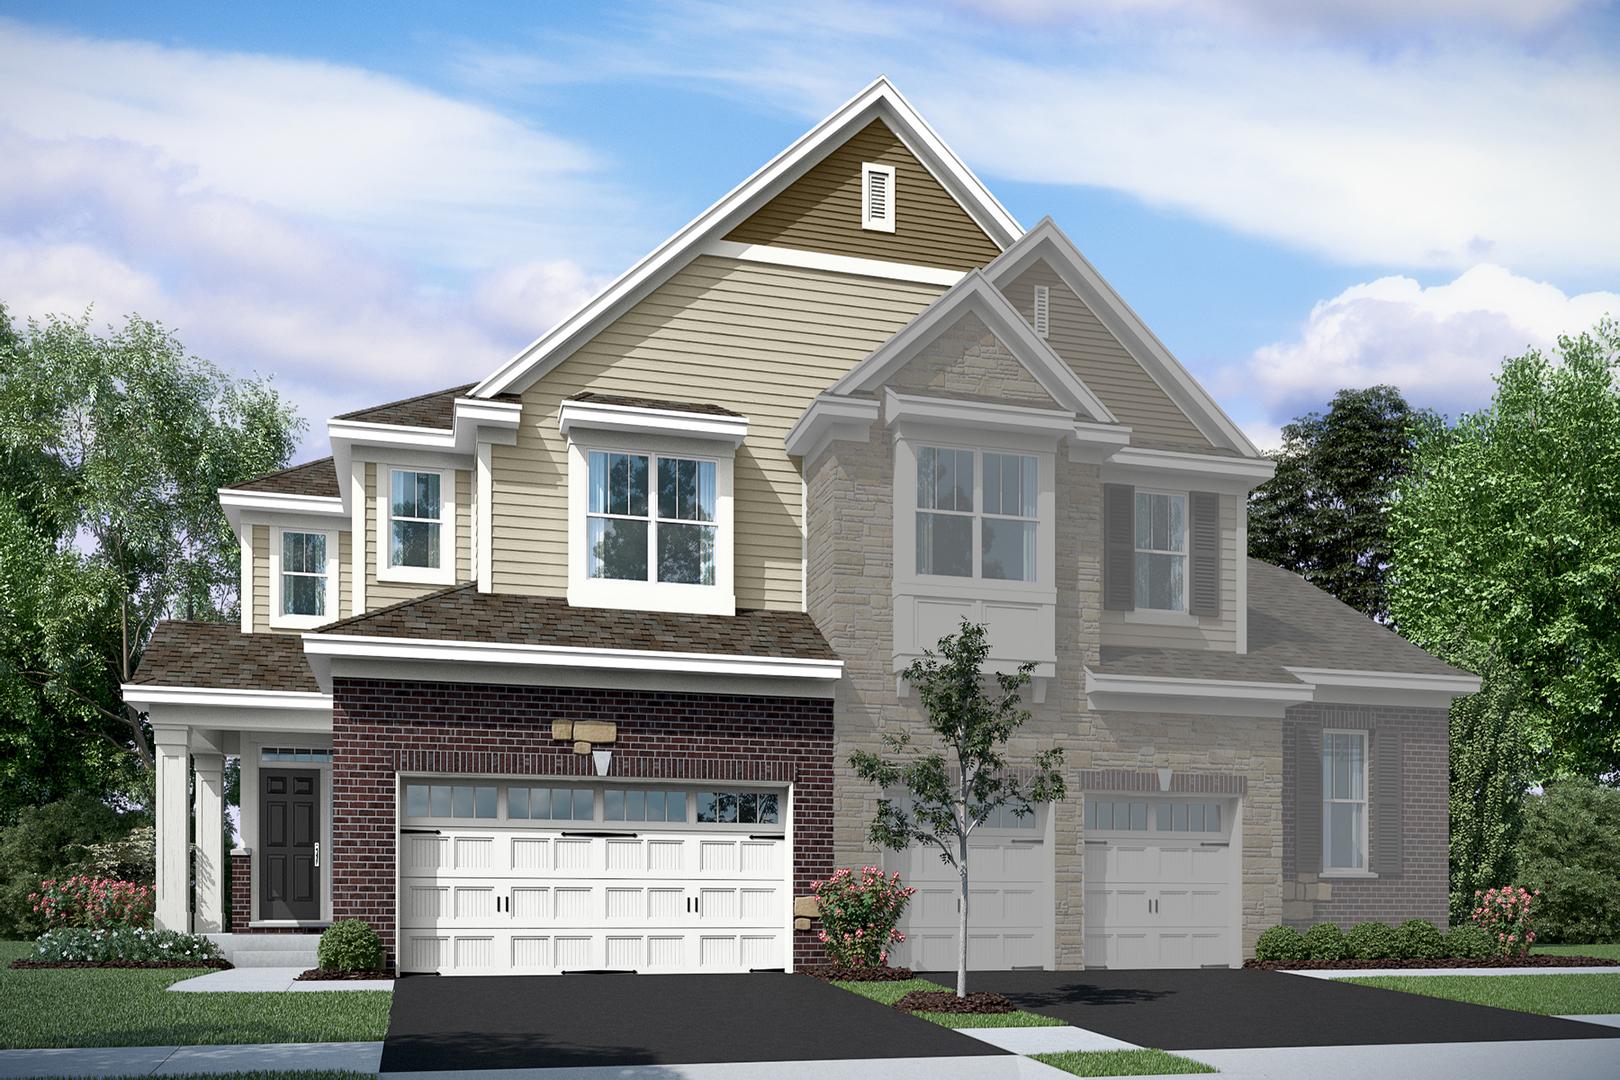 23087 N Pinehurst Lot # 81.01 Street, Kildeer, Il 60047